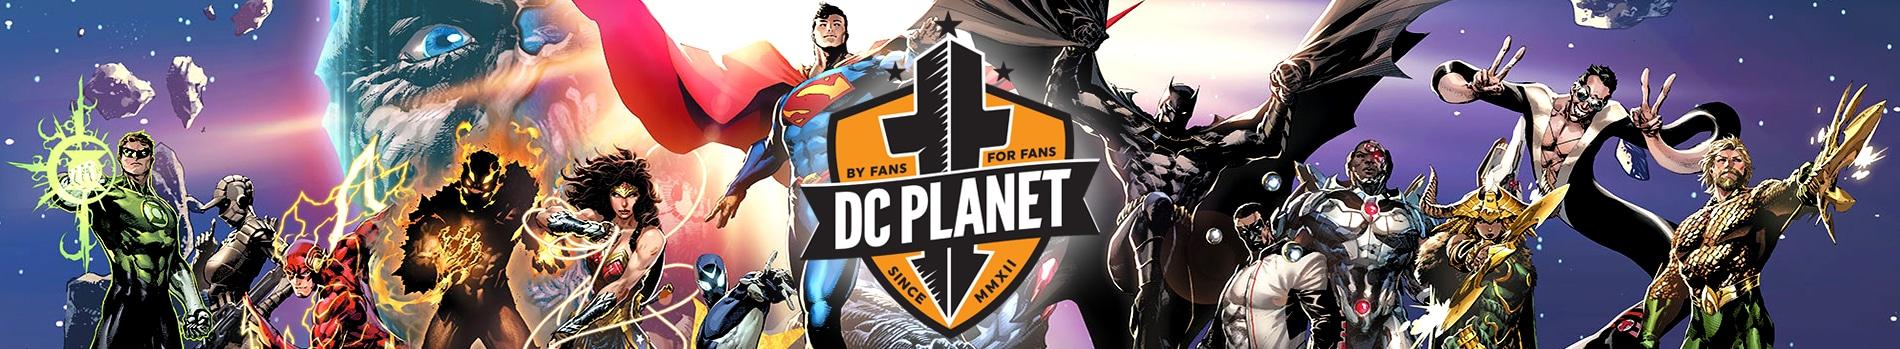 DC Planet